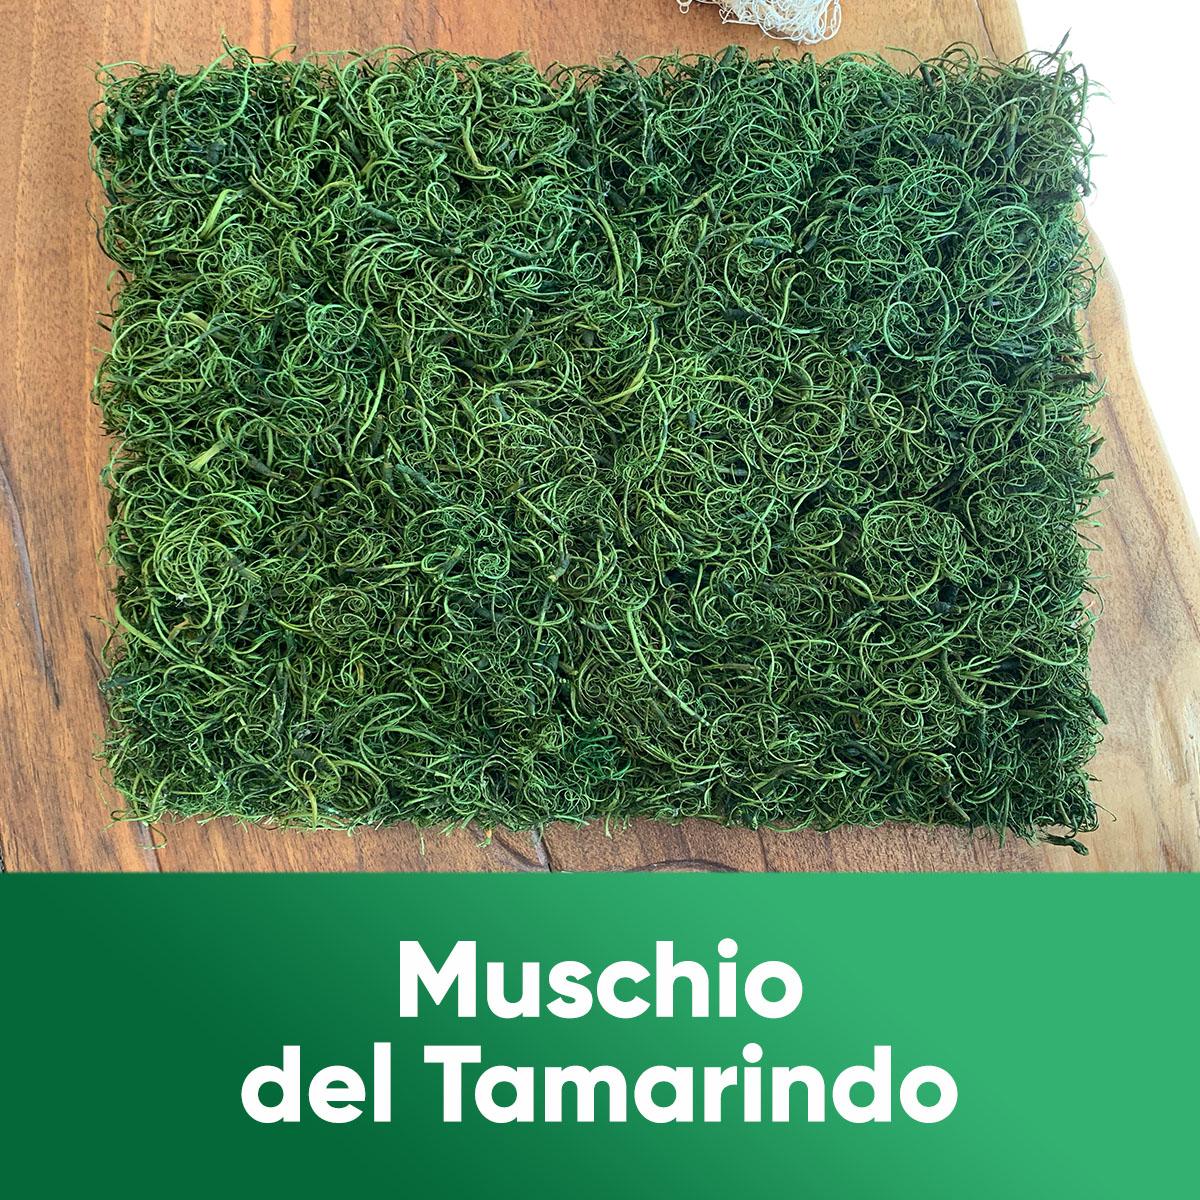 MUSCHIO DEL TAMARINDO